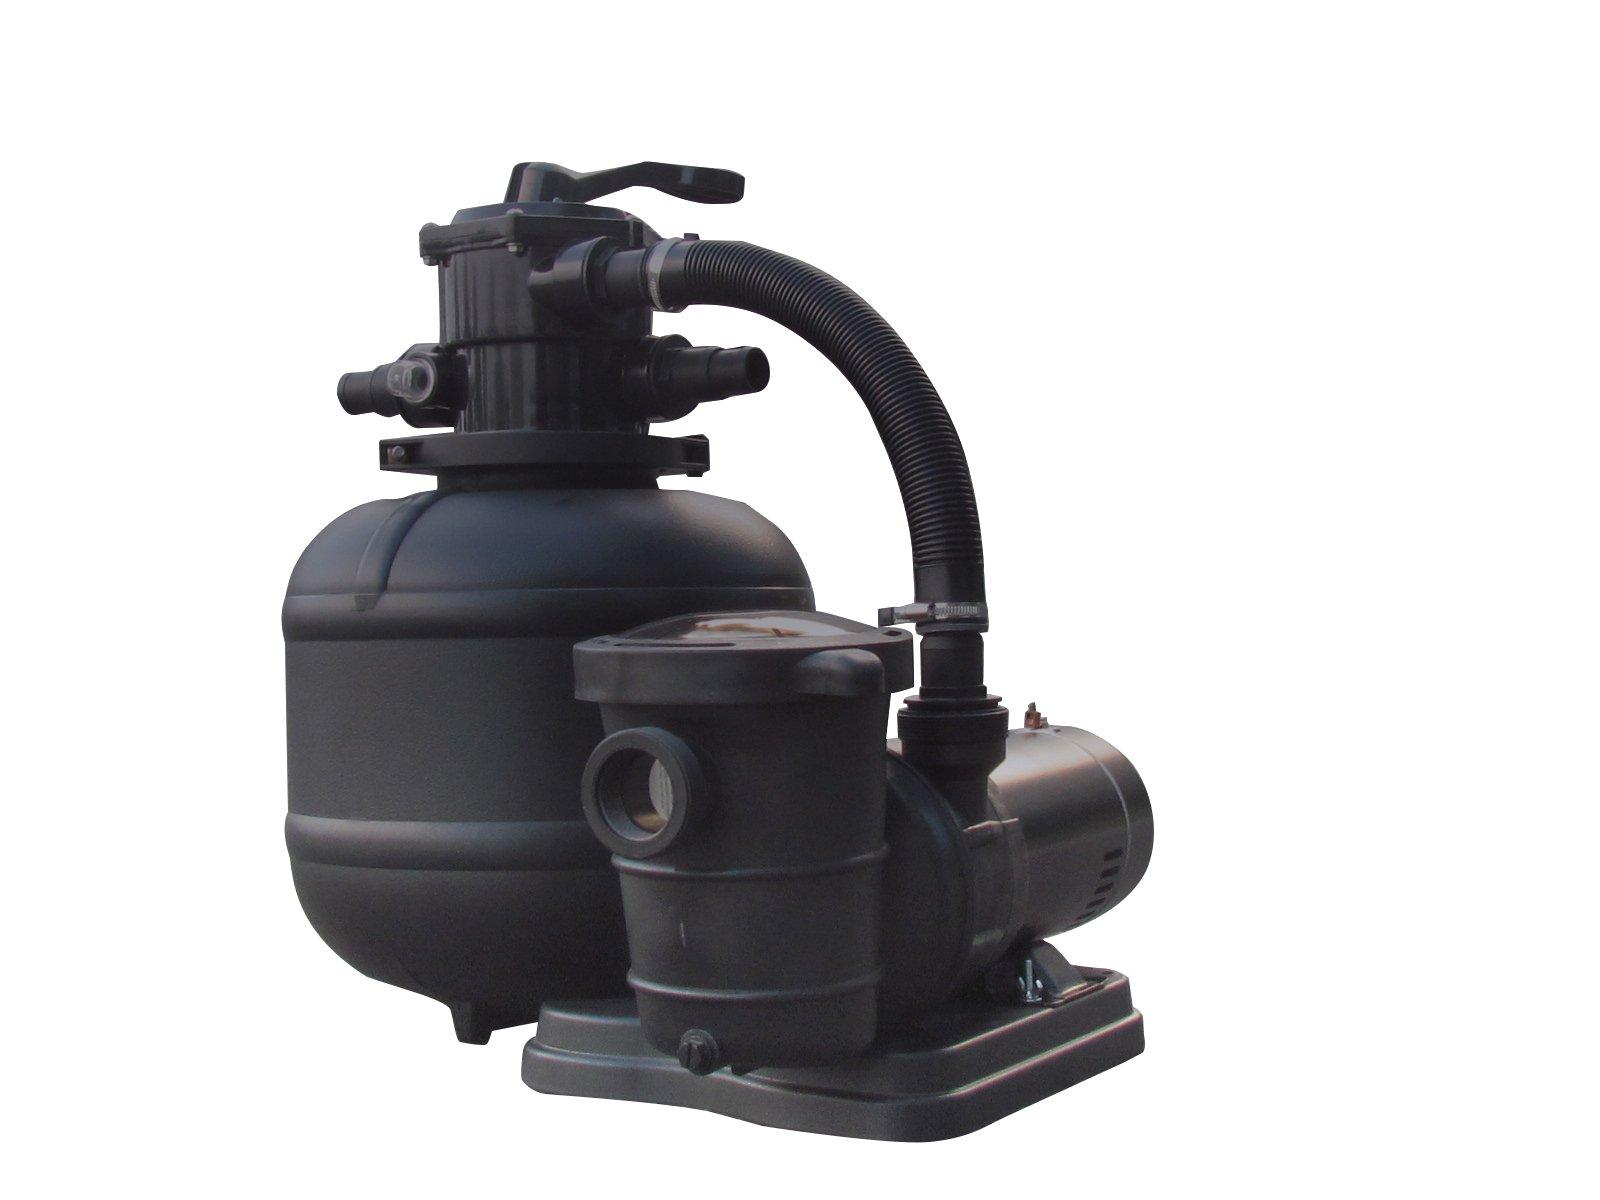 FlowXtreme NE4499 Pro 2 19-in 150lb Sand Filter System 2SP Pump for AG Pools, 5280-2400 GPH/1HP, Black by FlowXtreme